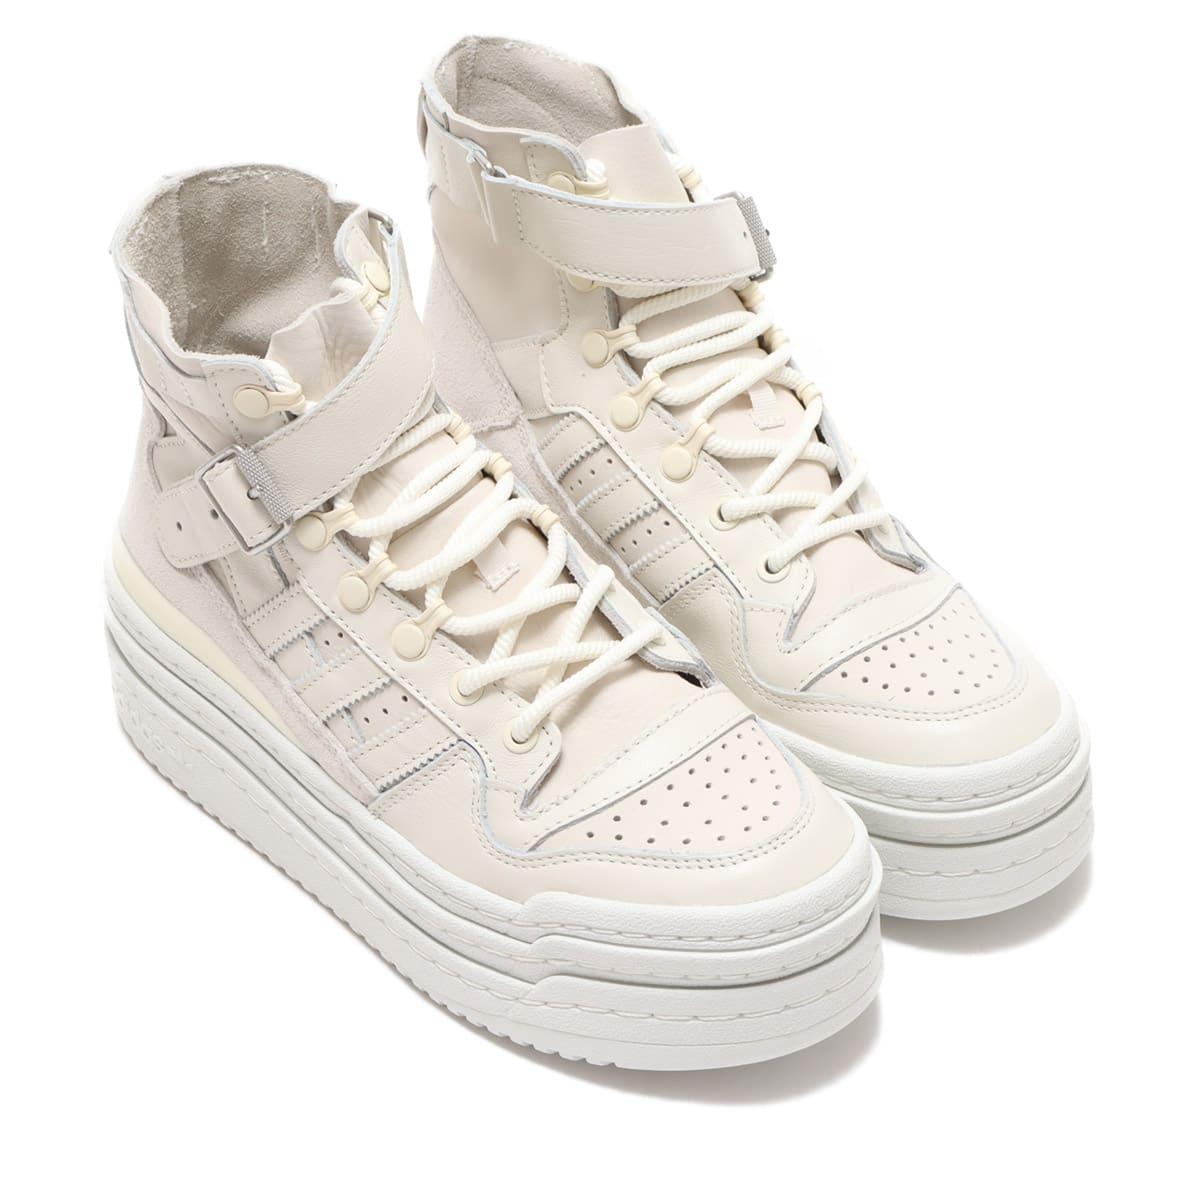 adidas TRIPLE PLATFORUM HI OFF WHITE/OFF WHITE/CREAM WHITE 21SS-S_photo_large